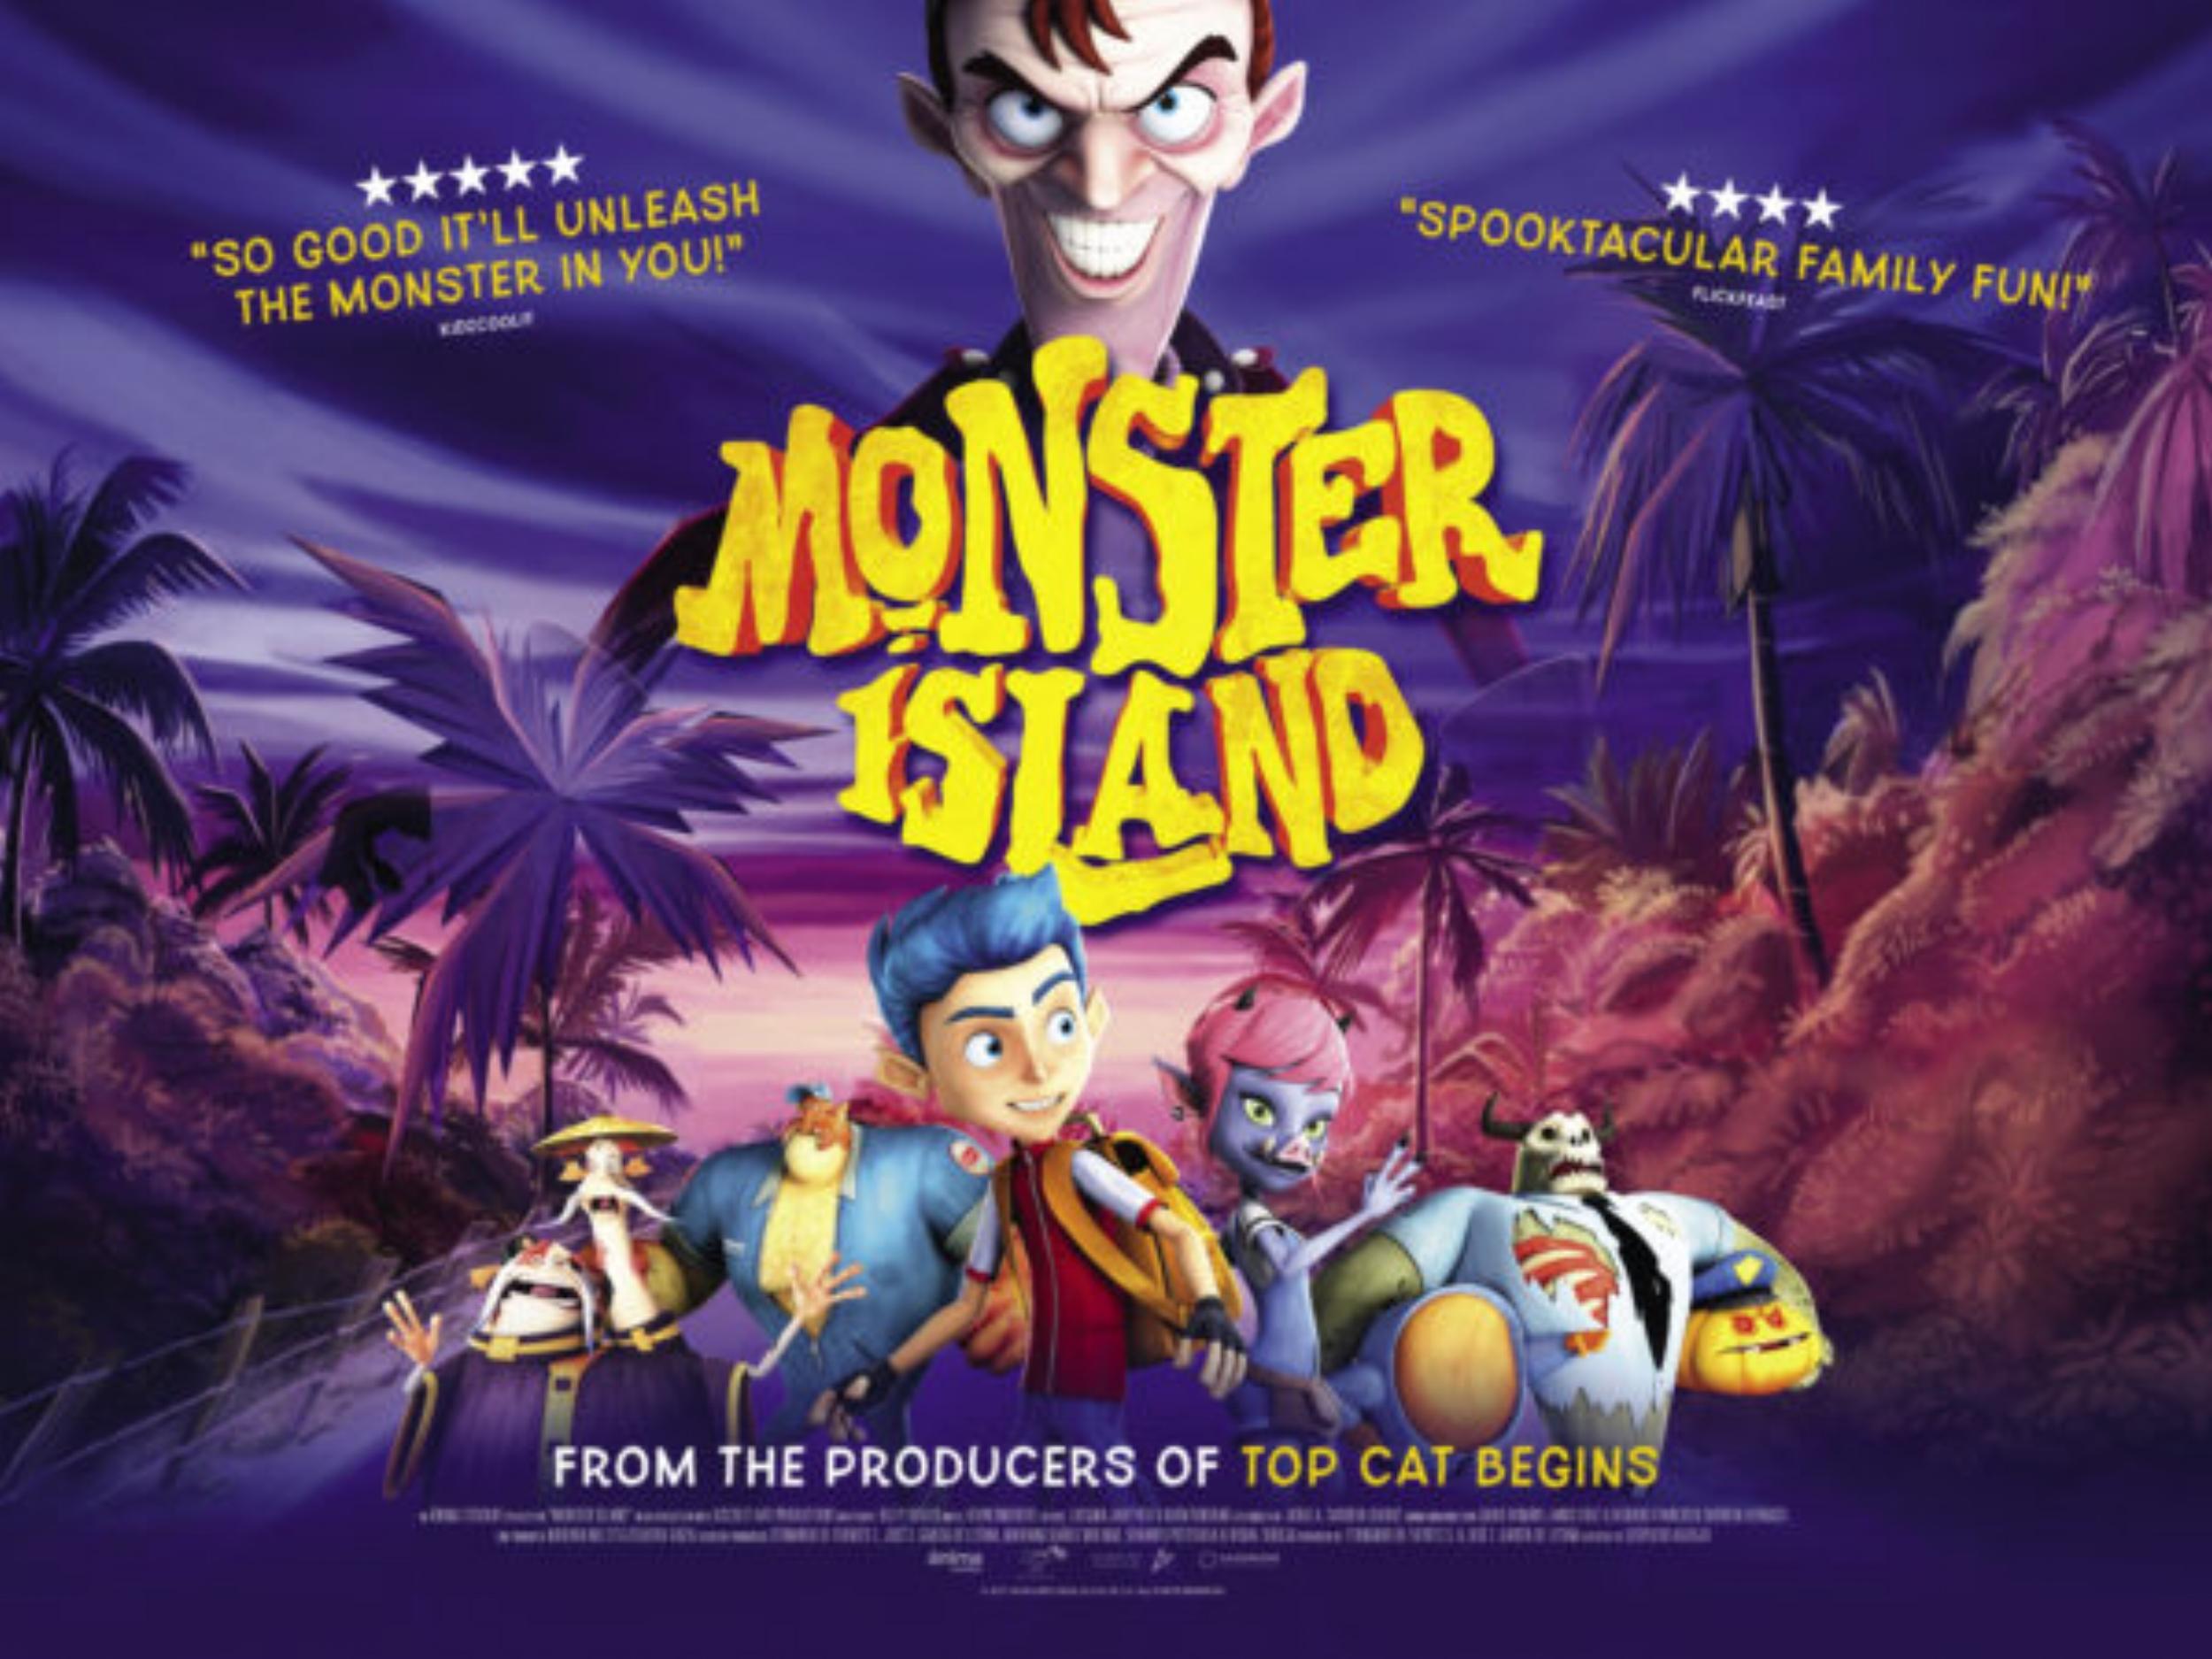 MonsterIsland_UK_QUAD-2-600x450.jpg